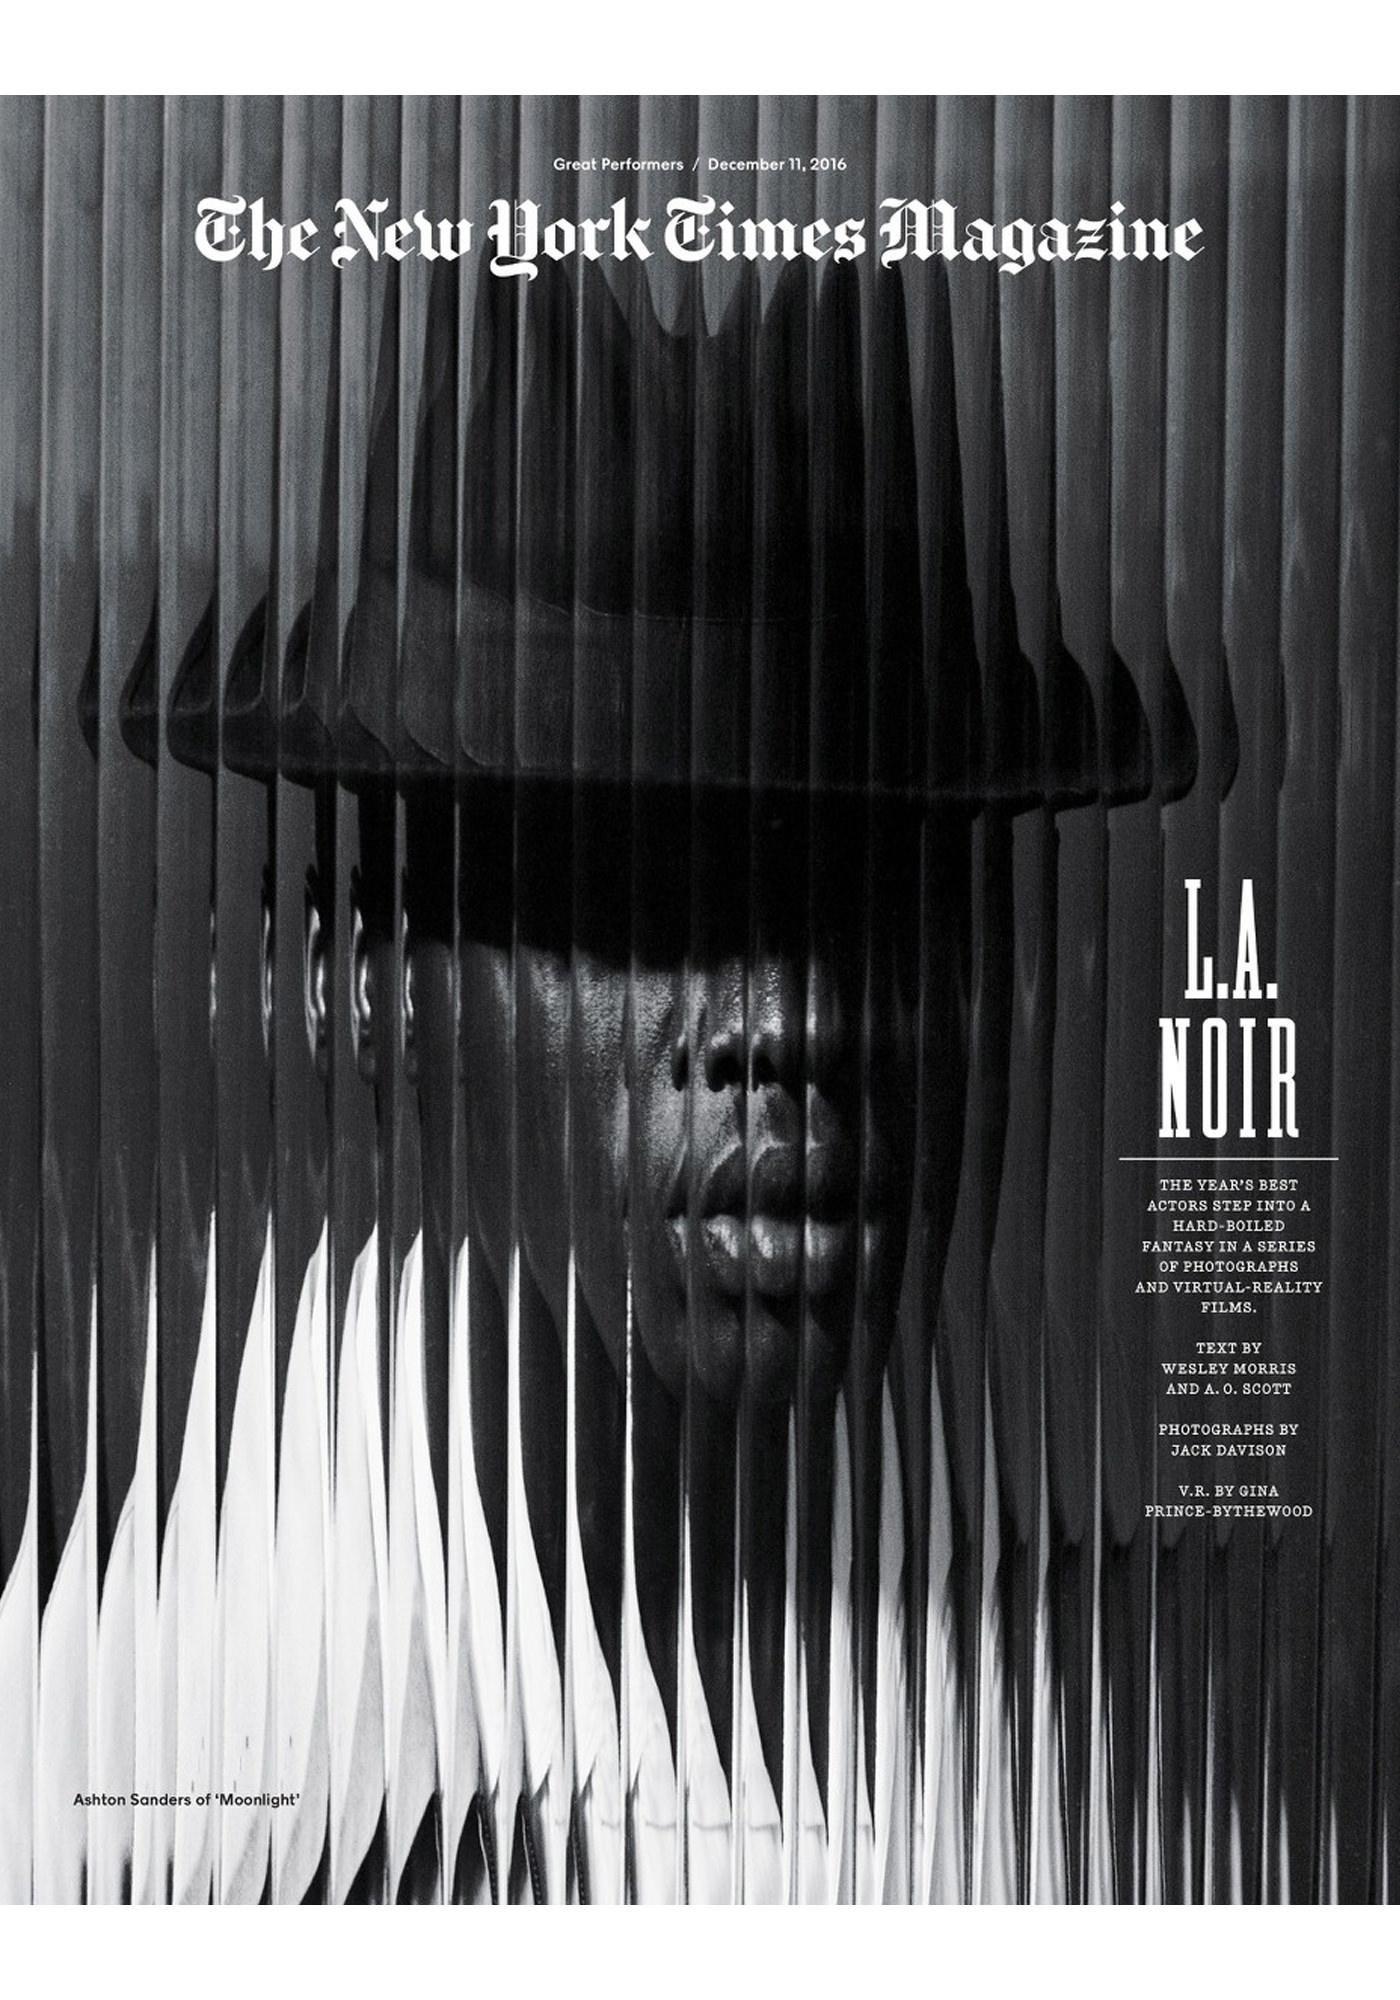 Jack Davison Photographie Magazine Cover New York Times Couleur